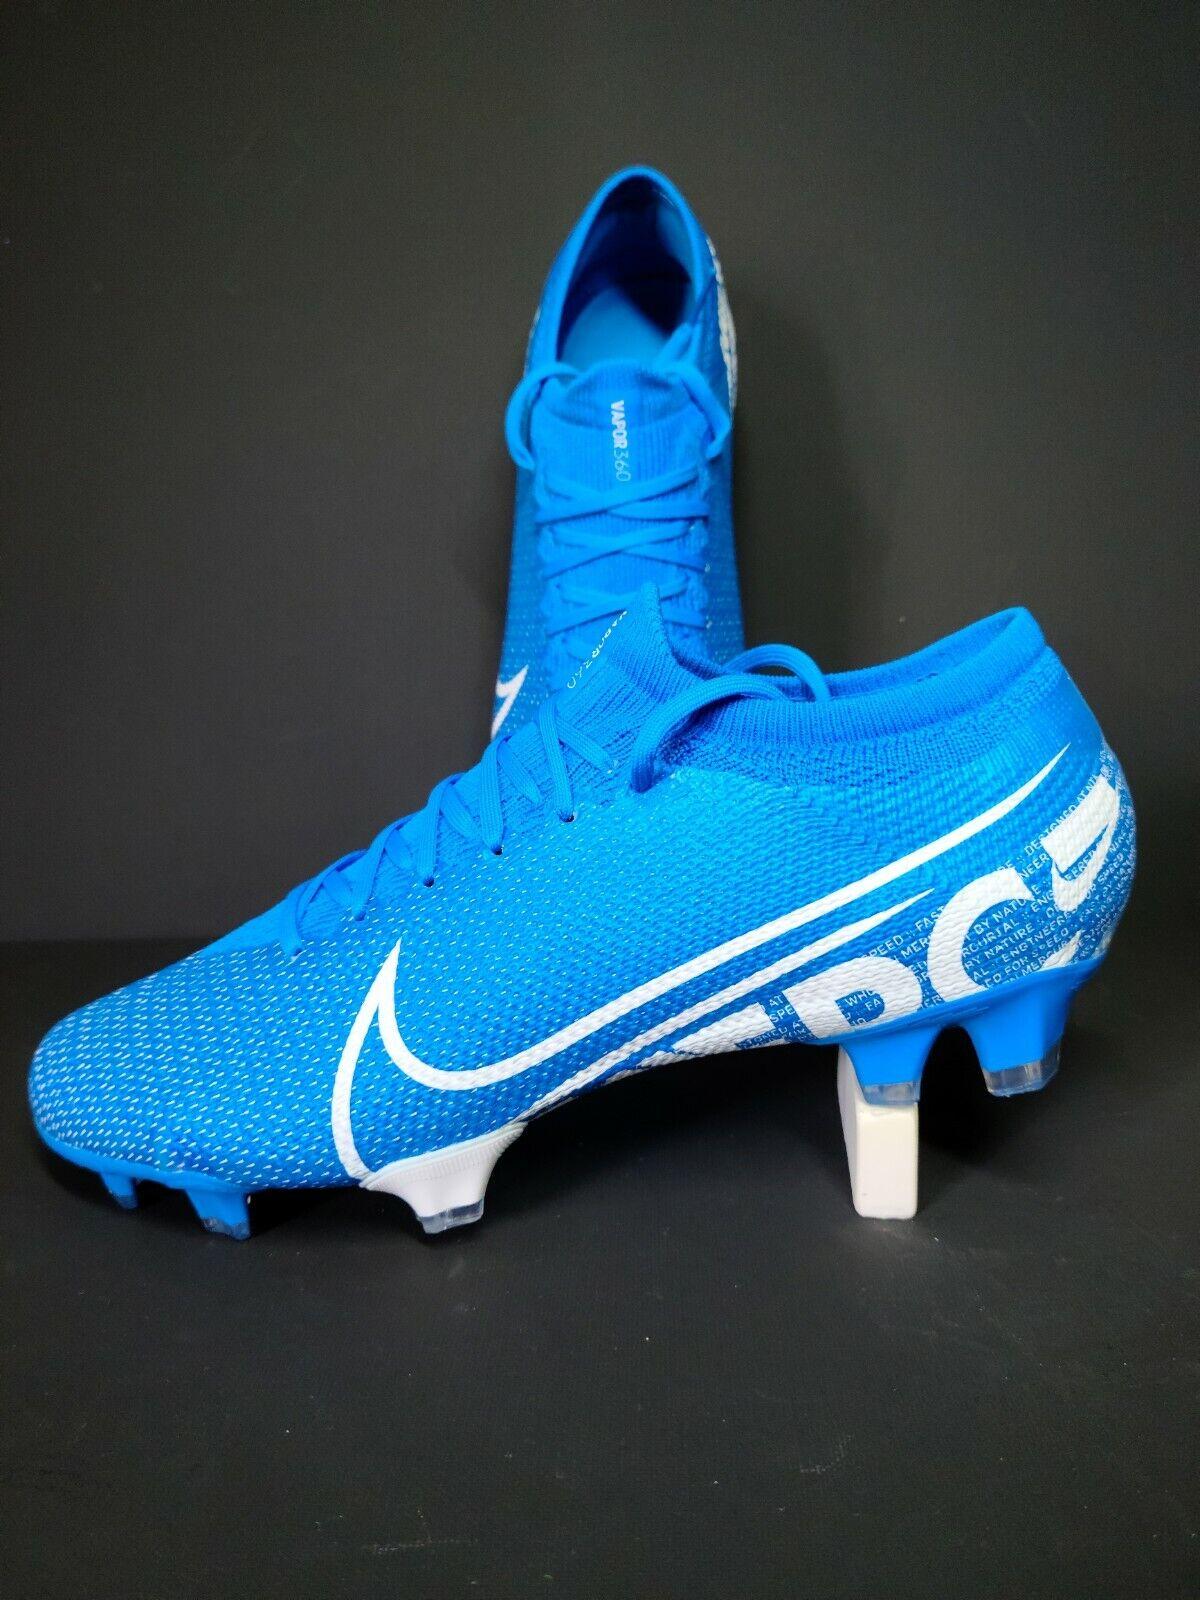 Intacto Mucama Amigo  Nike Mercurial Vapor X FG Cr7 Soccer Cleats Futbol 684860-018 Mens Size 12  for sale online | eBay